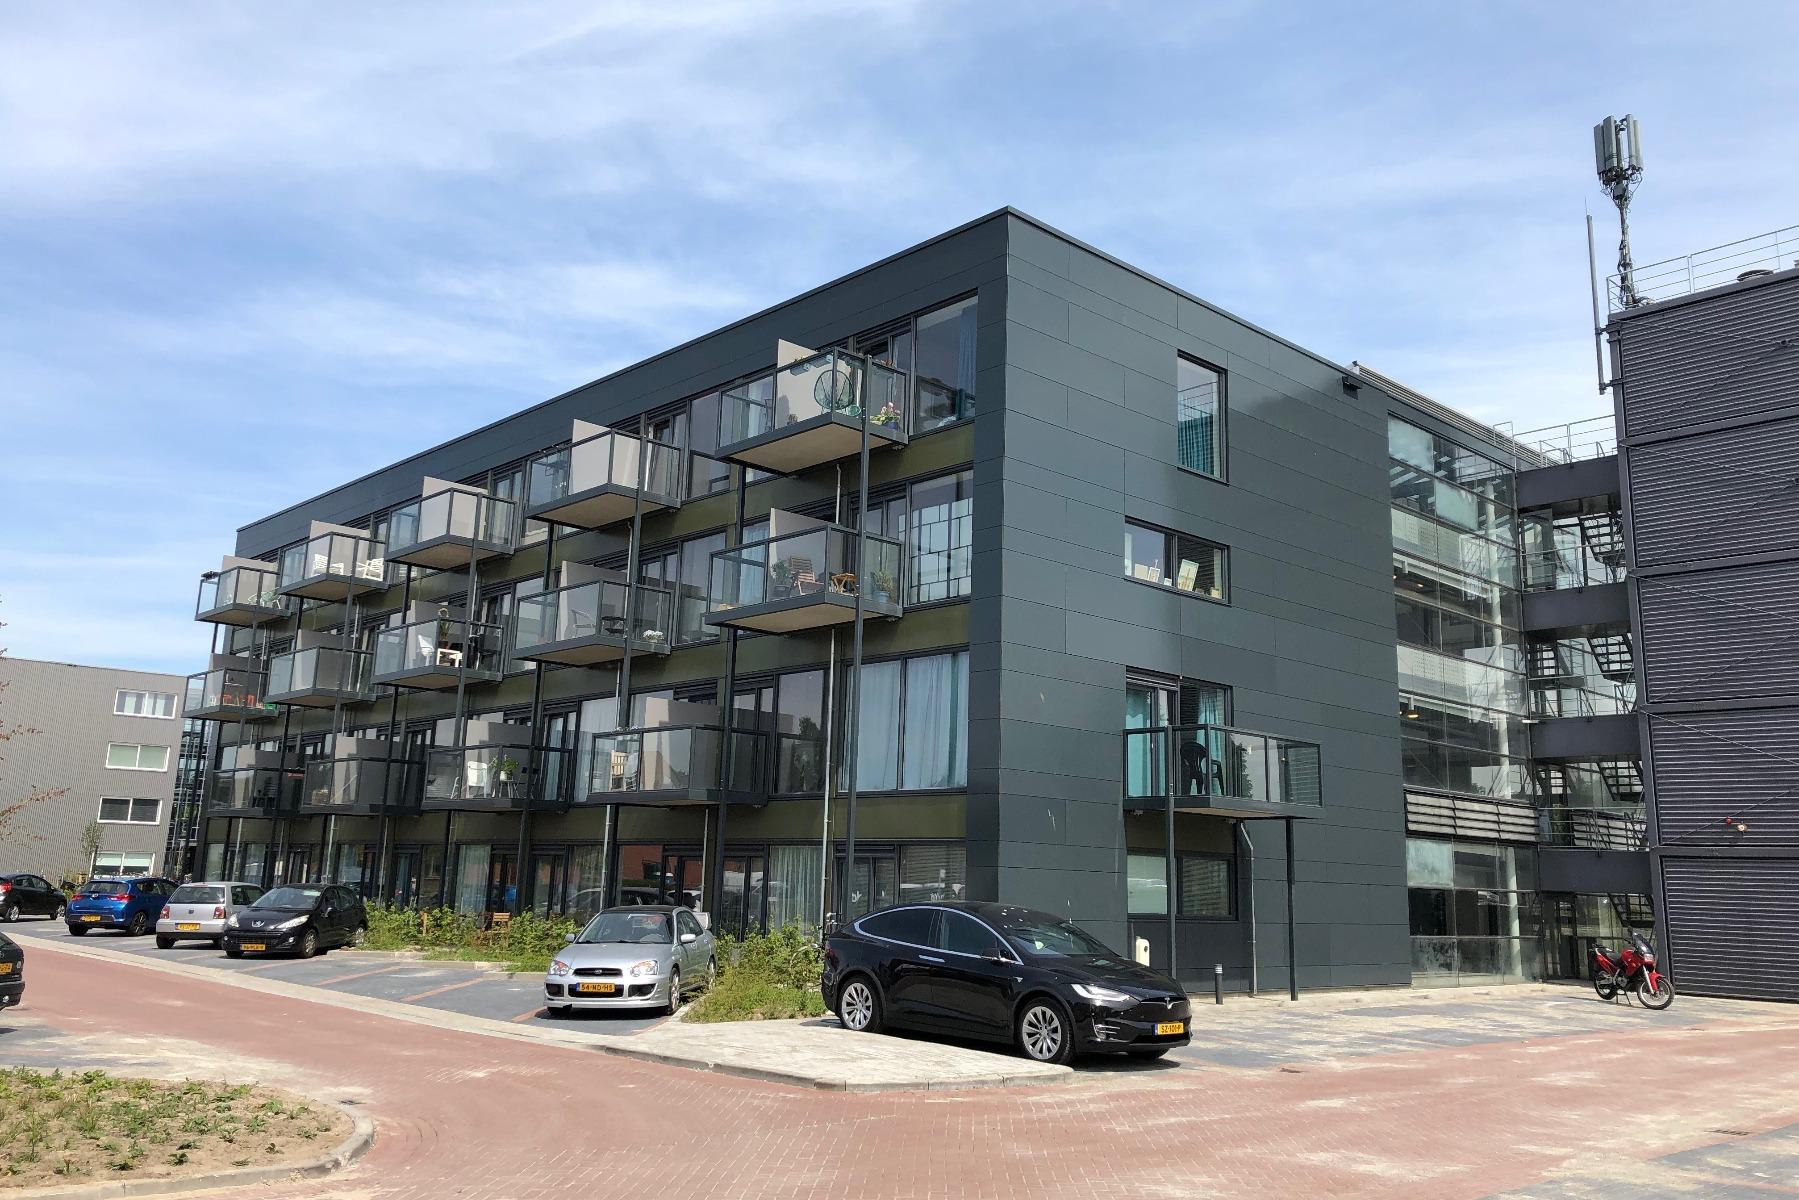 residential lofts in nieuwegein